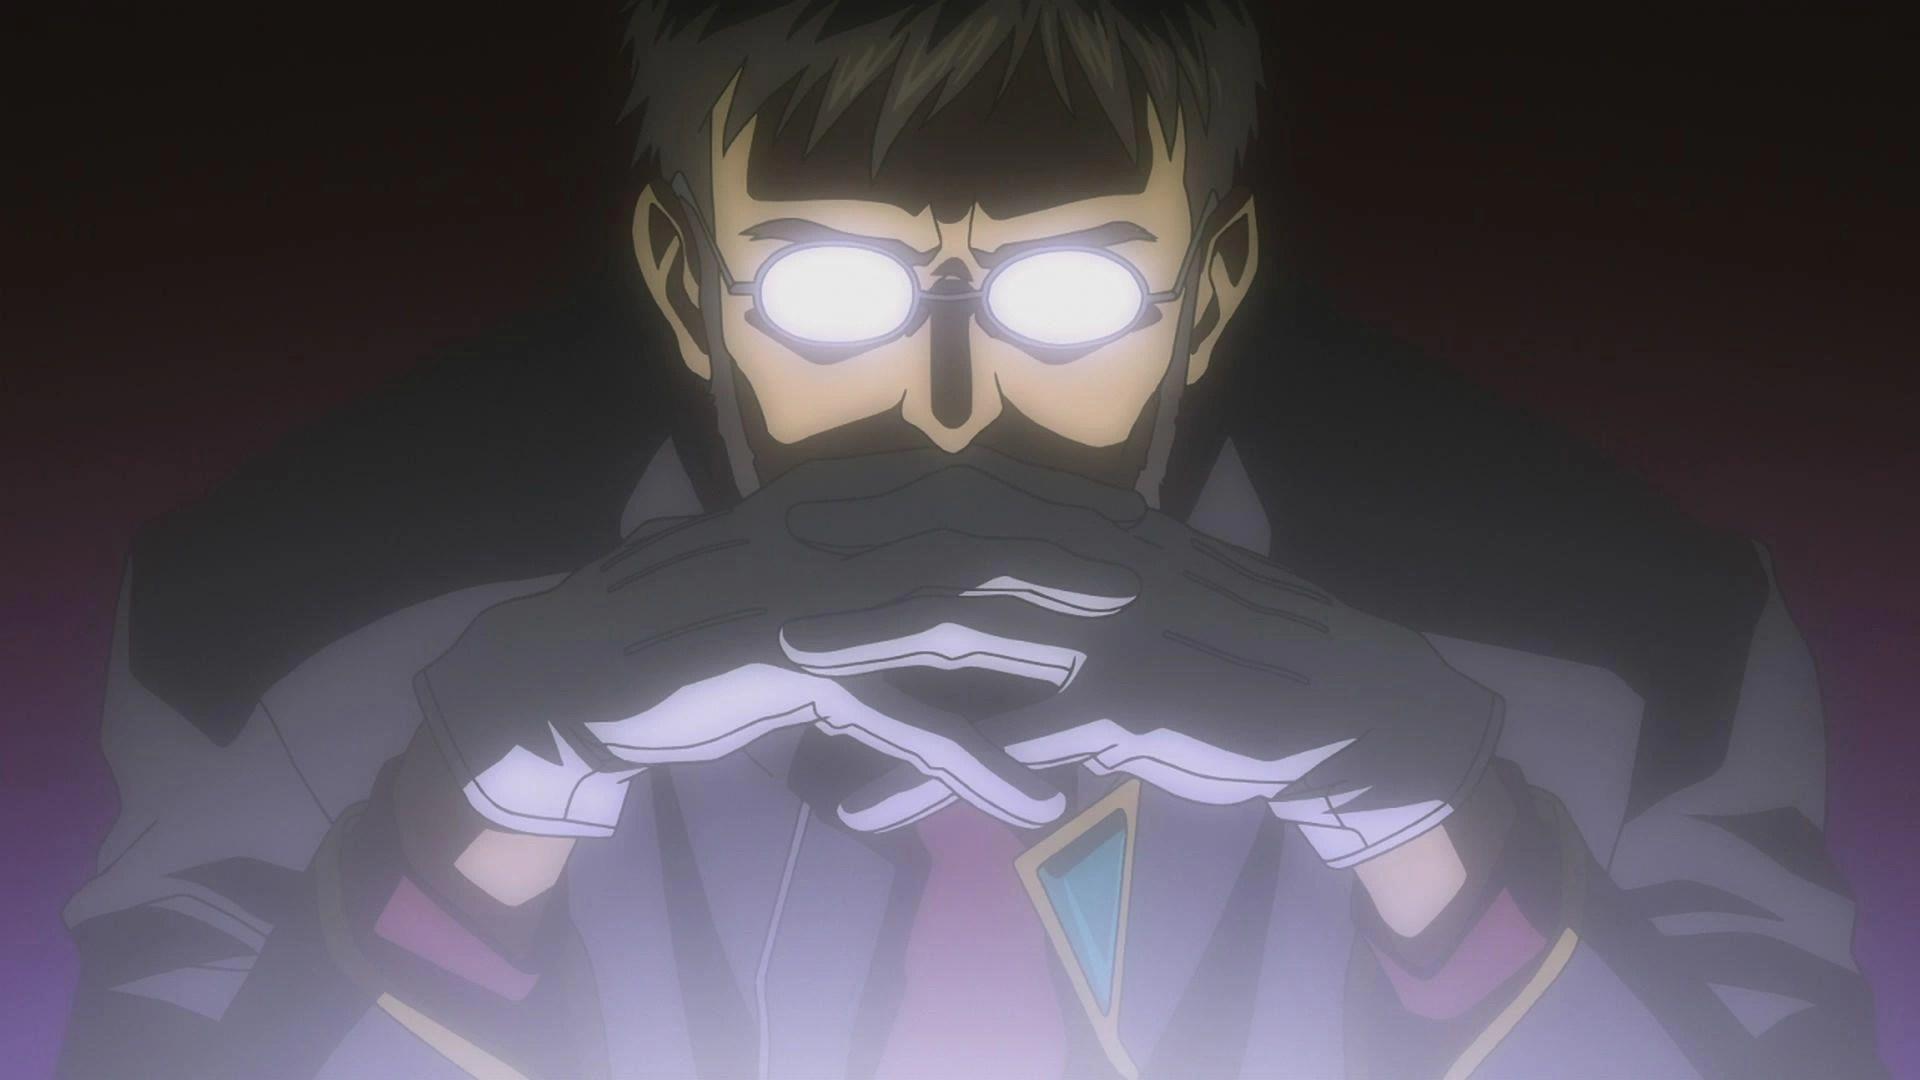 Gendo Ikari, Evangelion